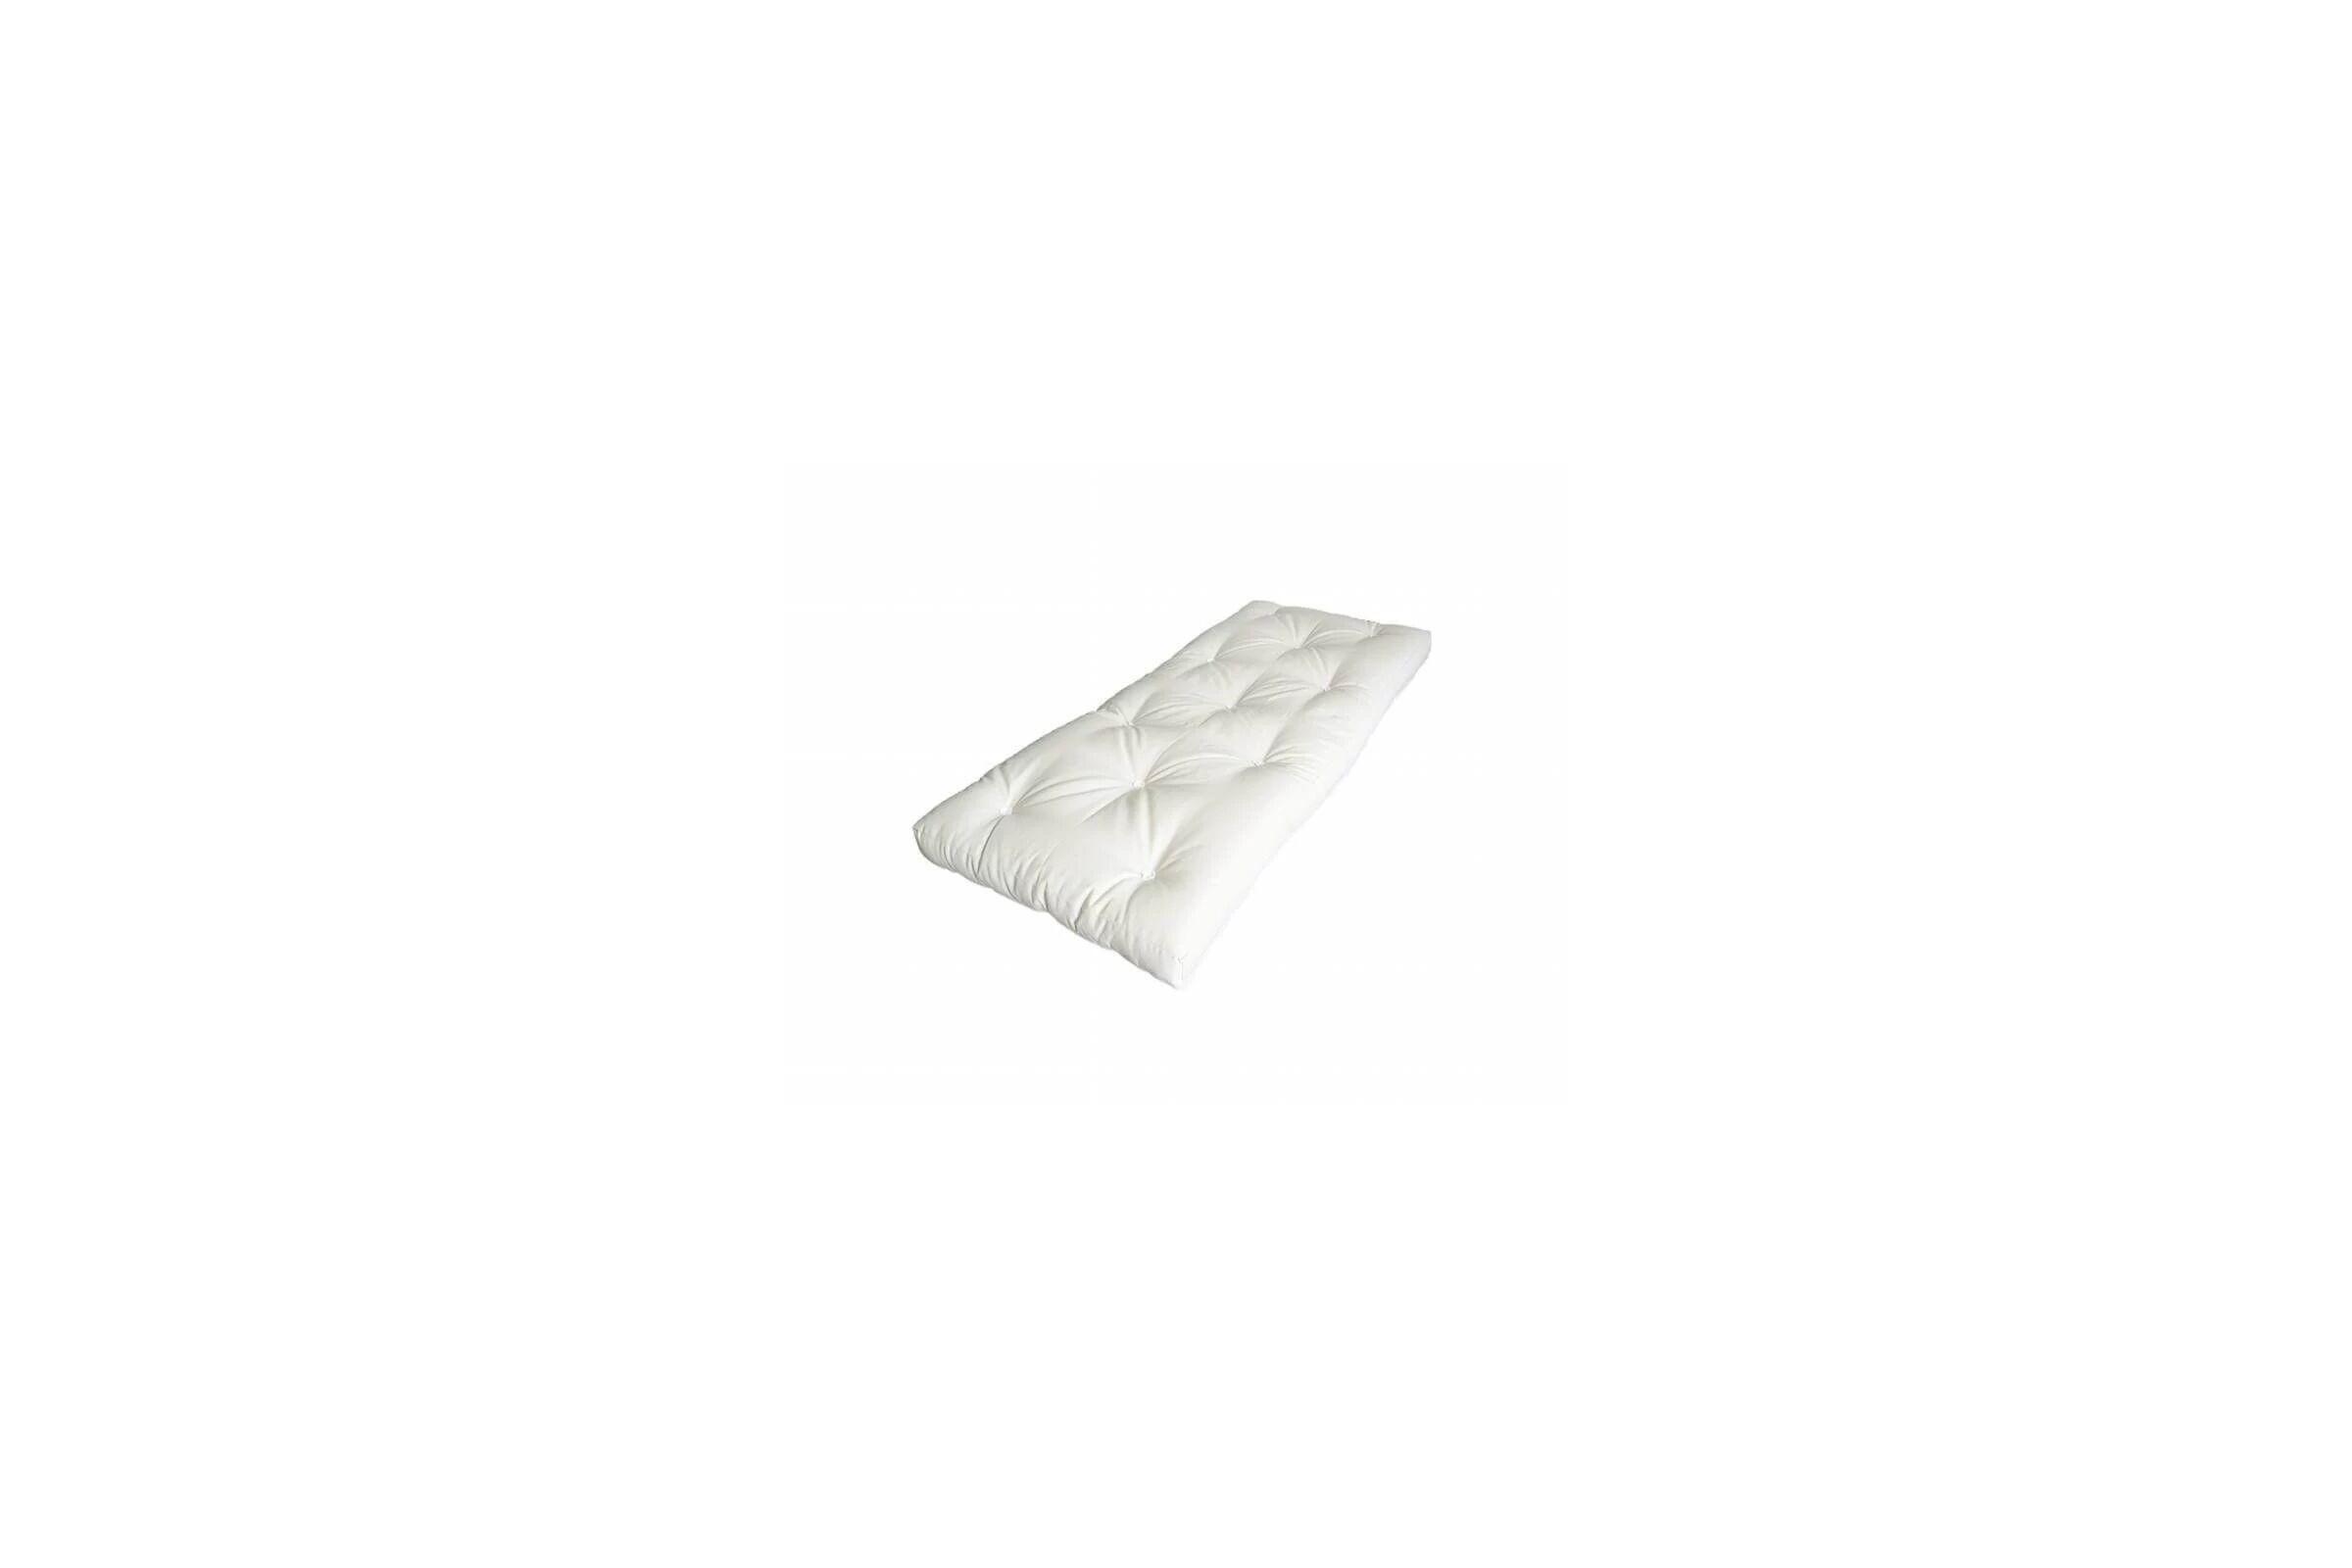 Abc meubles - matelas futon latex 1 place 80x190